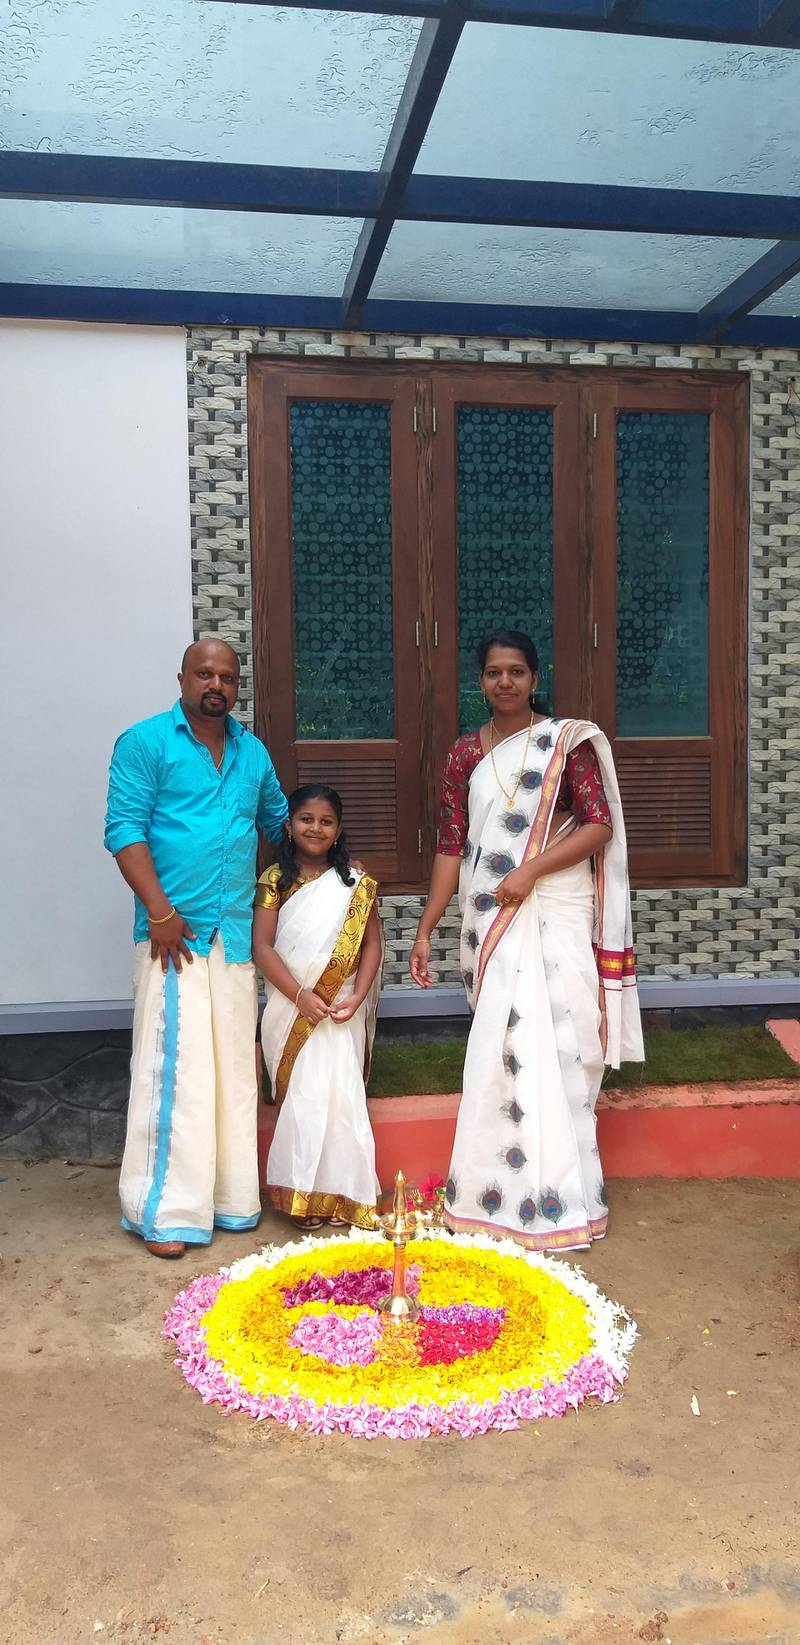 Soumya Devi, her husband Hari Prasad and their elder daughter Bhadra in their hometown of Kerala in southern India. The family tells of home amid the coronavirus pandemic. Courtesy: Hari Prasad